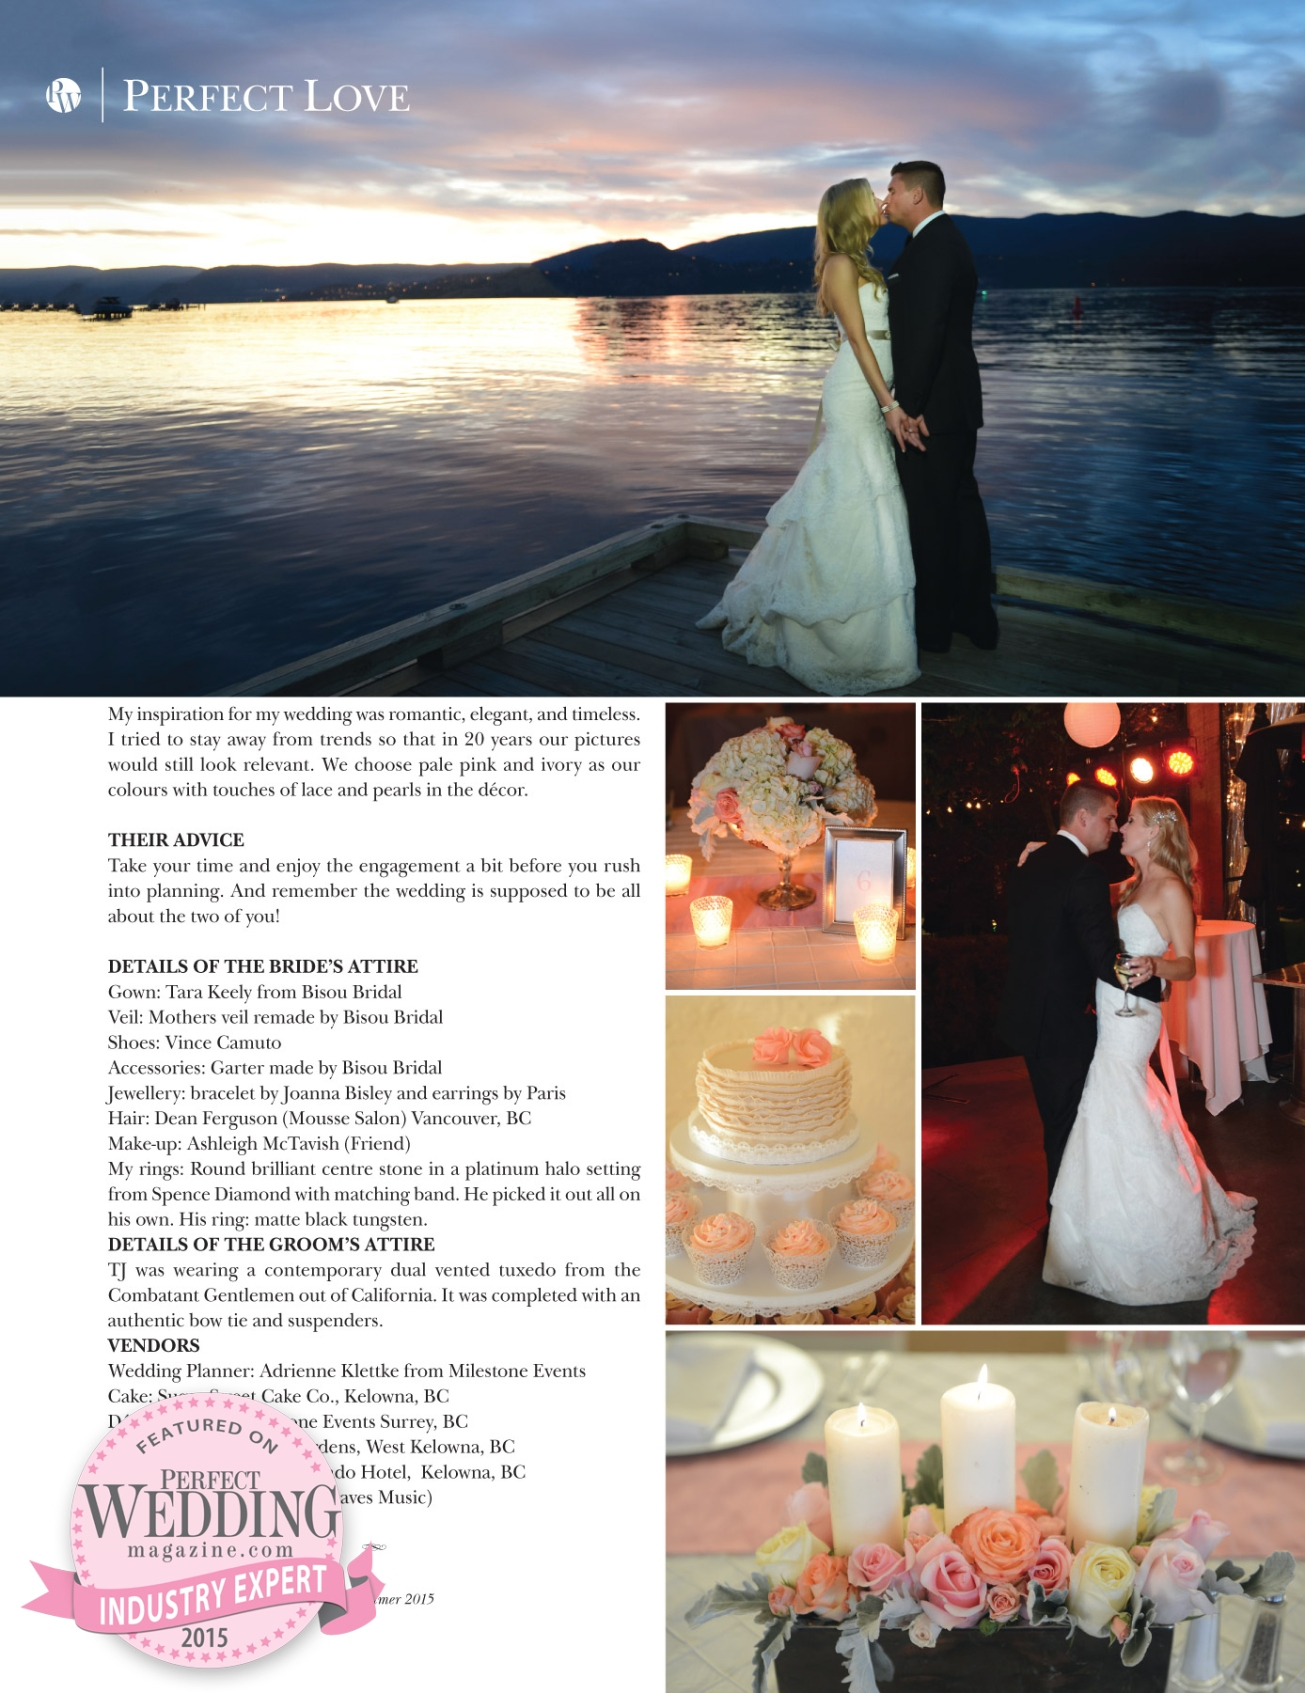 Hotel Eldorado - Kelowna Okanagan Weddings